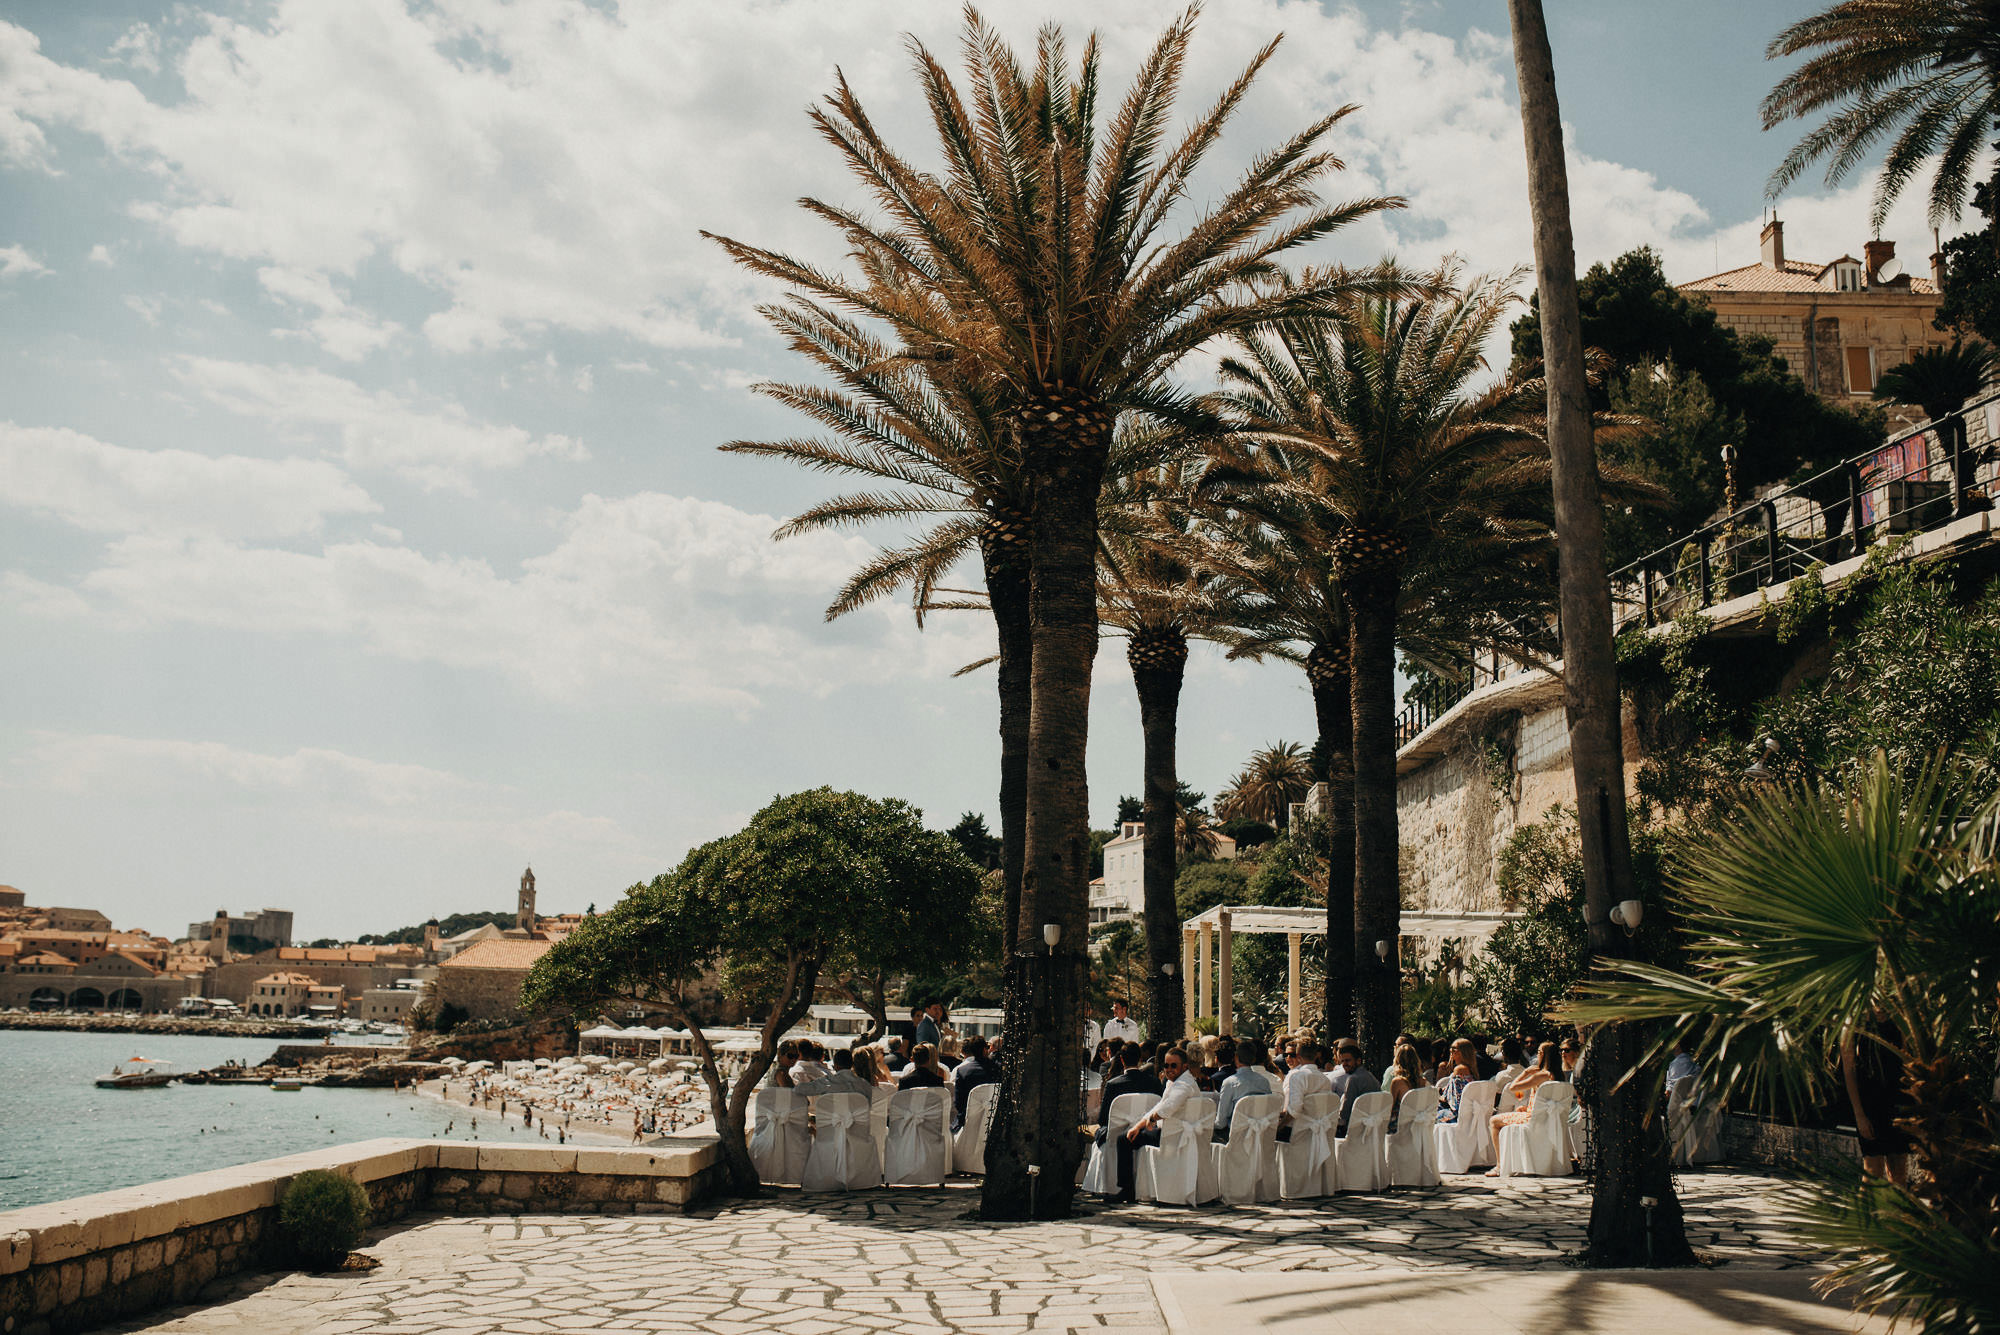 dubrovnik_croatia_wedding_photographer-jere_satamo-destination_weddings-036-web.jpg